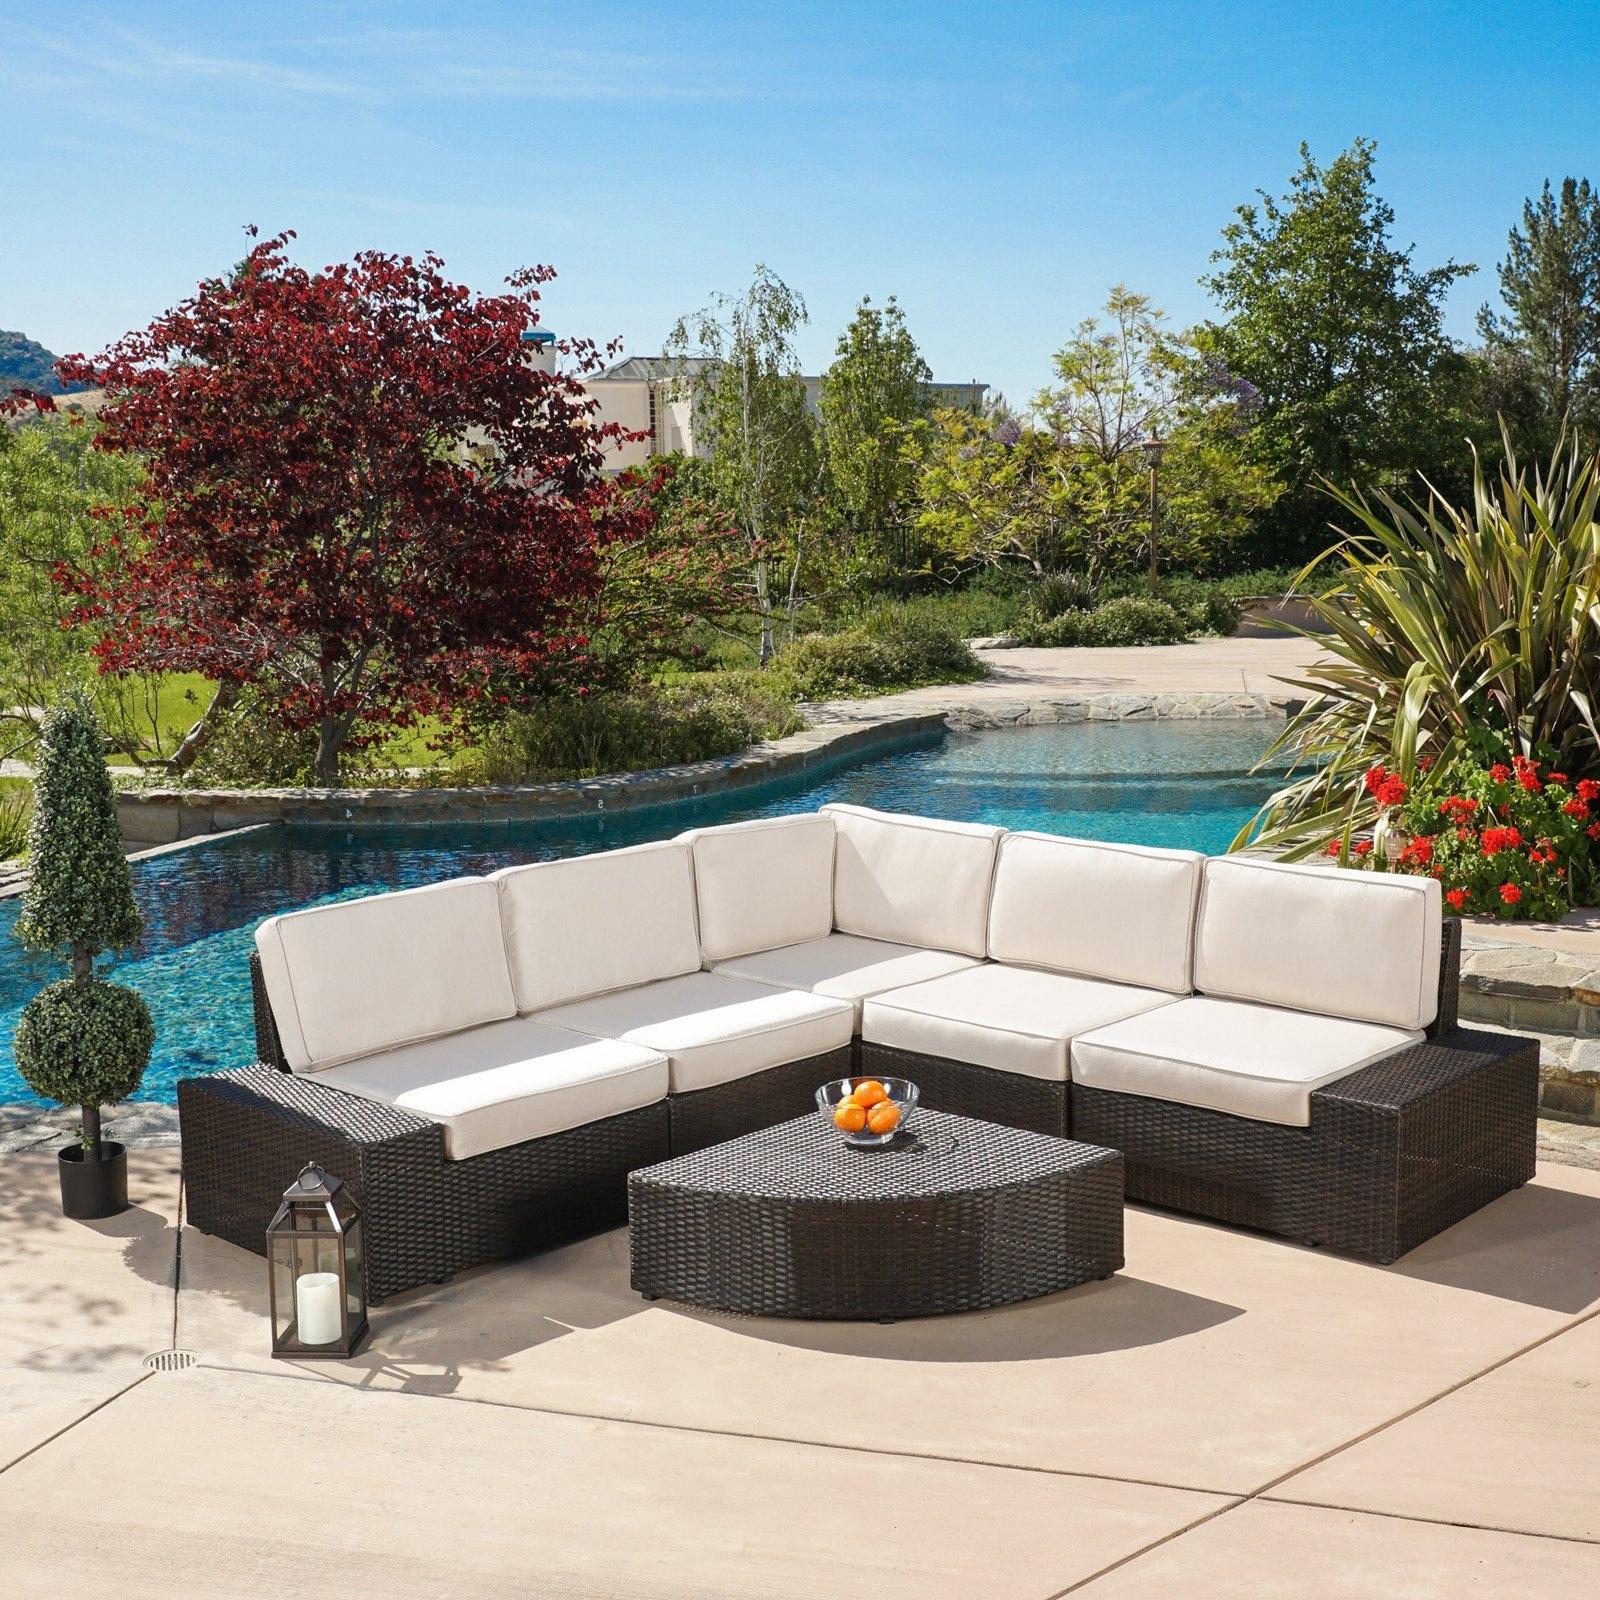 Zora Outdoor 6 Piece Sofa Conversation Set – Walmart Regarding Current Patio Conversation Sets With Sunbrella Cushions (View 20 of 20)